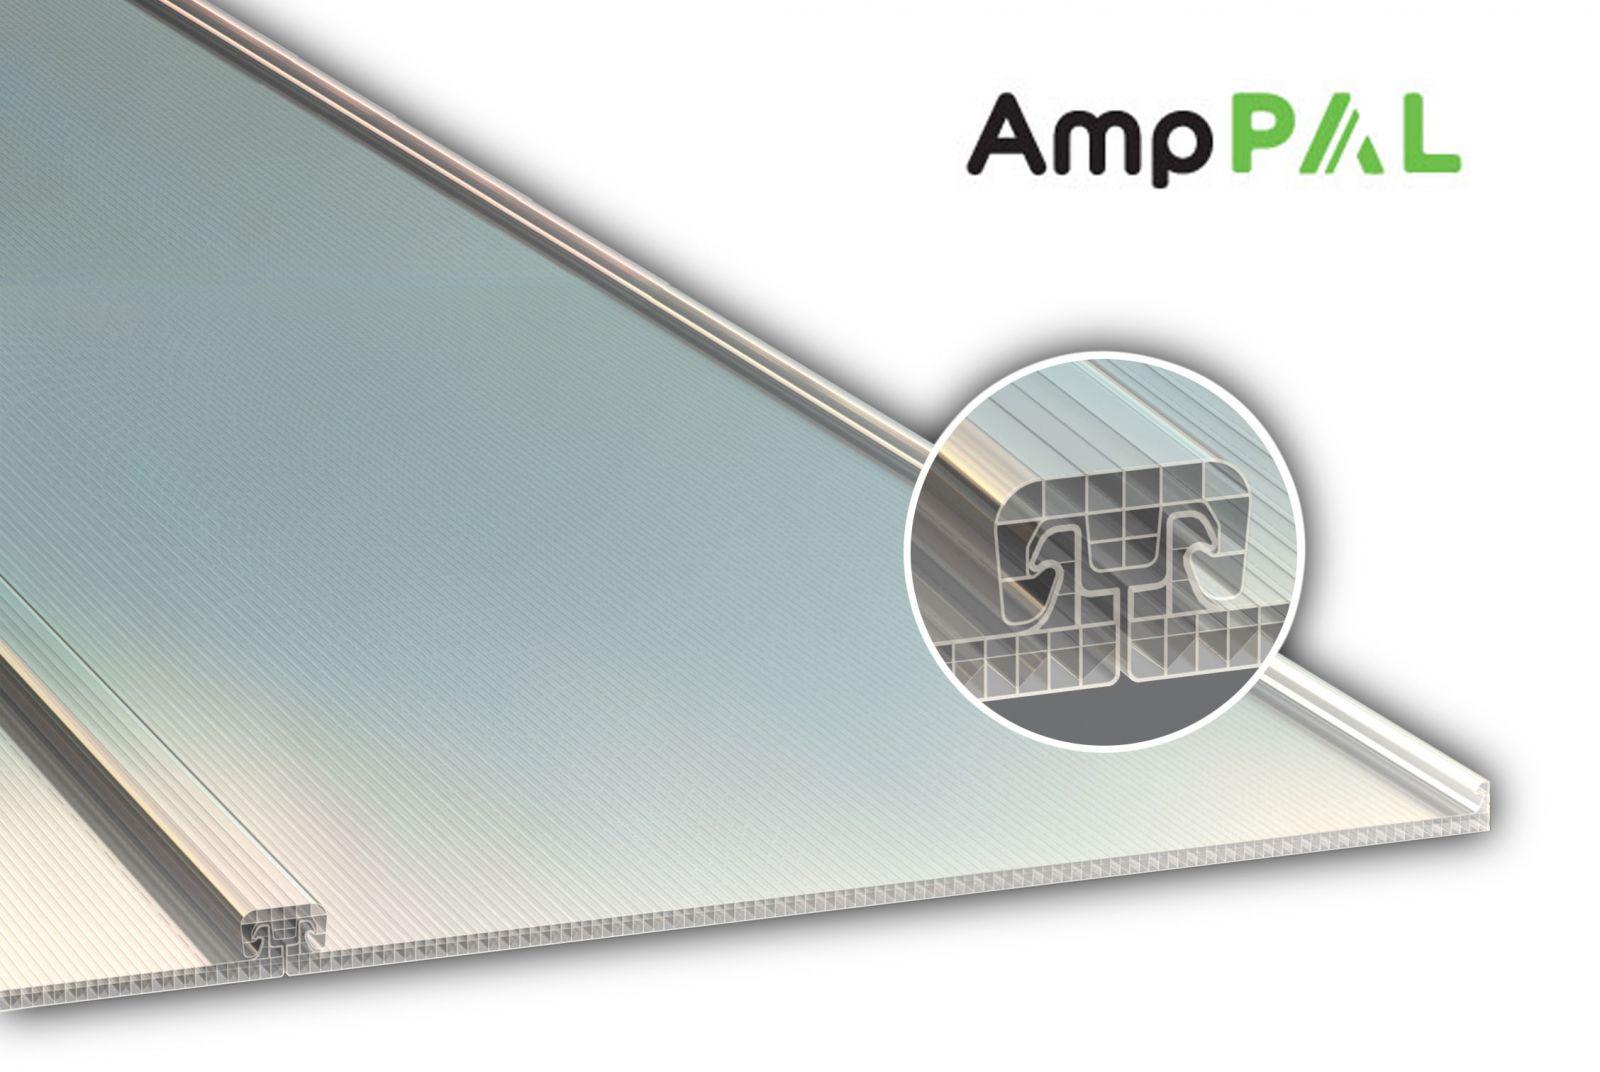 AMPPAL (แอมพาวล์)